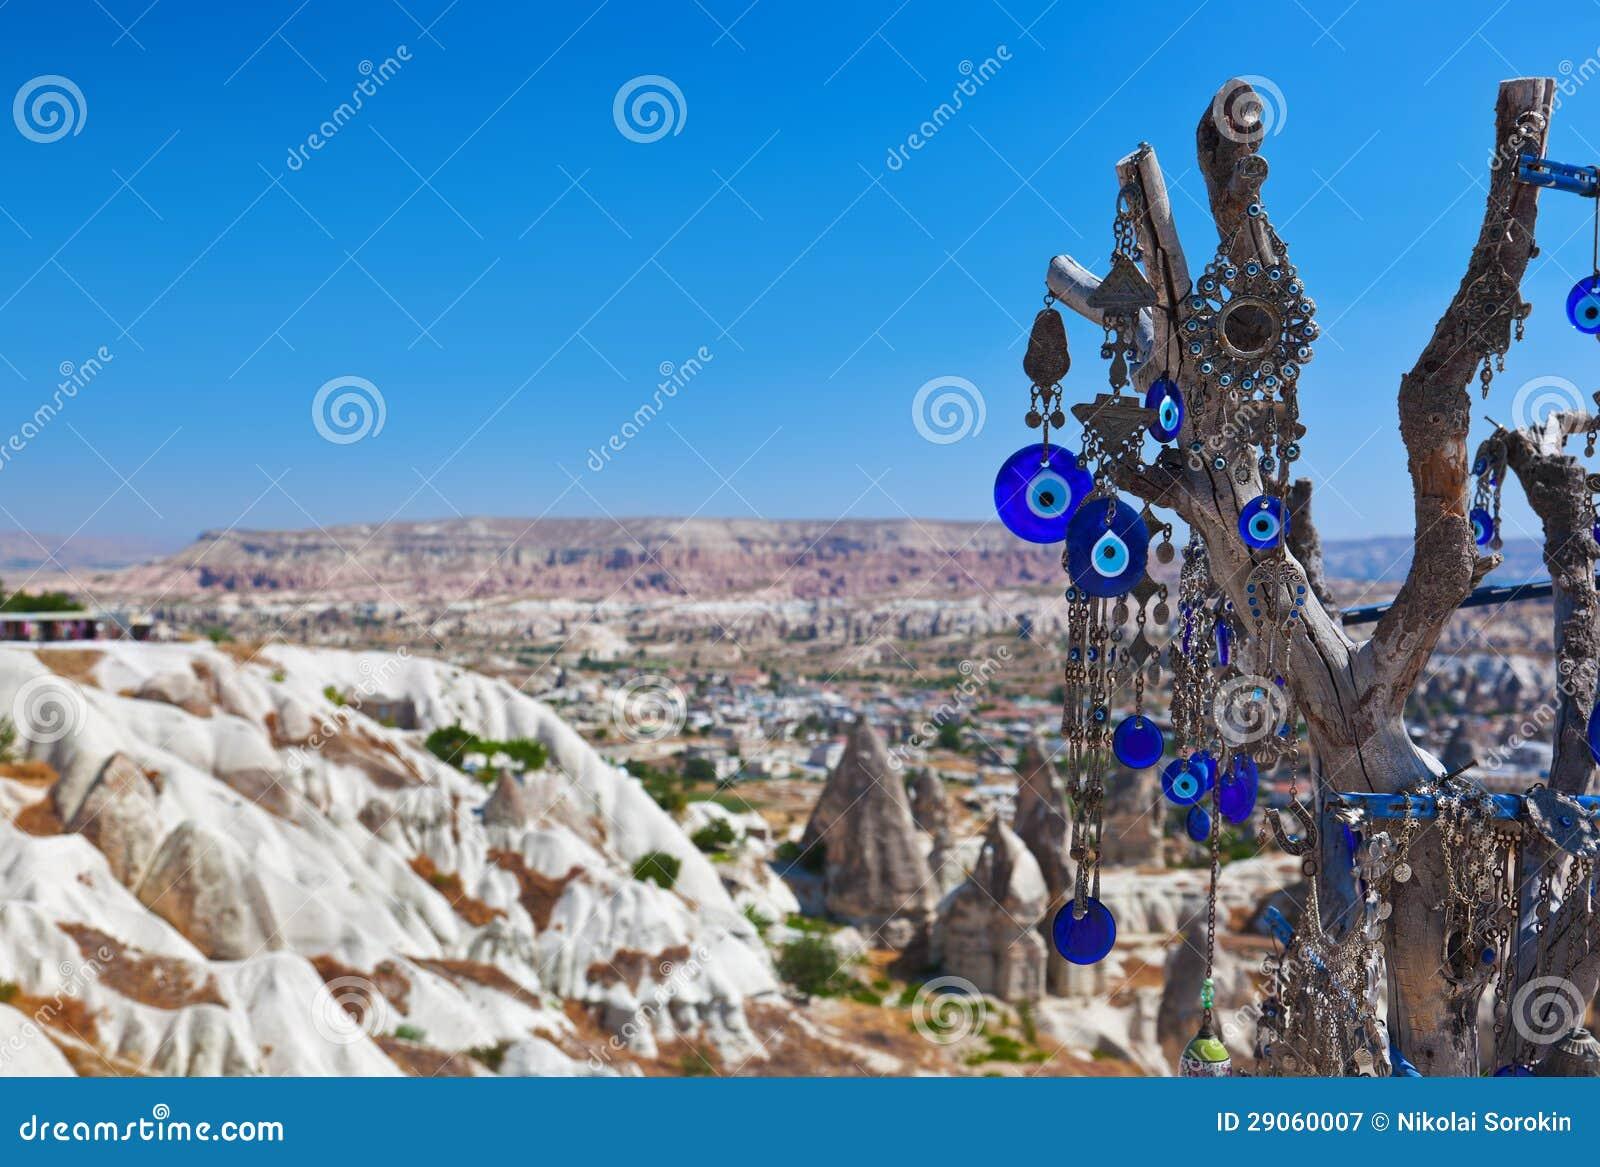 tree and evil eye amulet in cappadocia turkey stock image